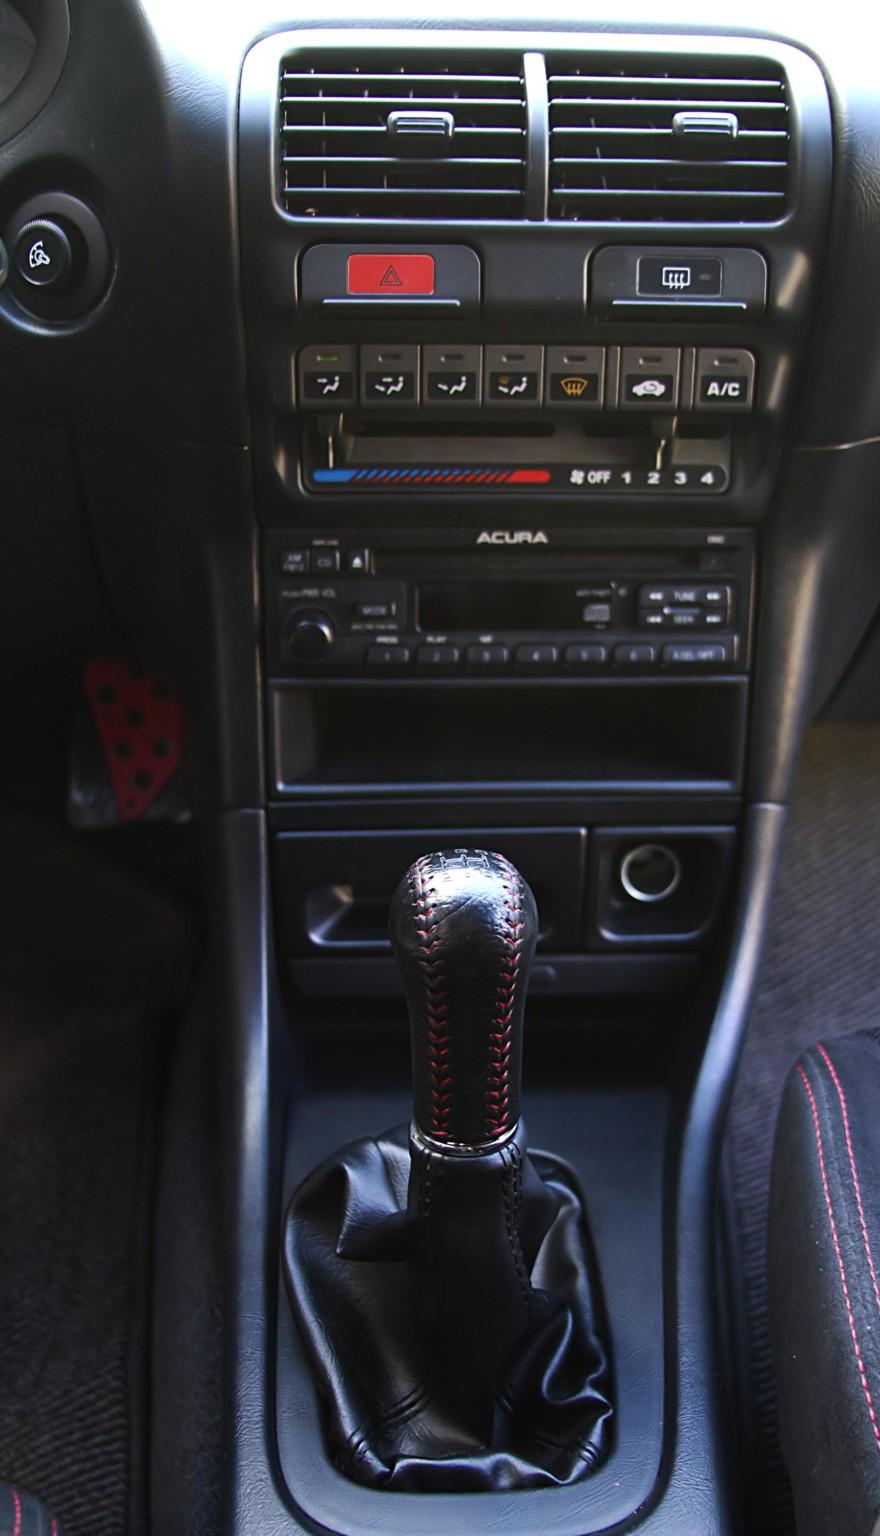 1998 Acura Integra Type R shifter knob